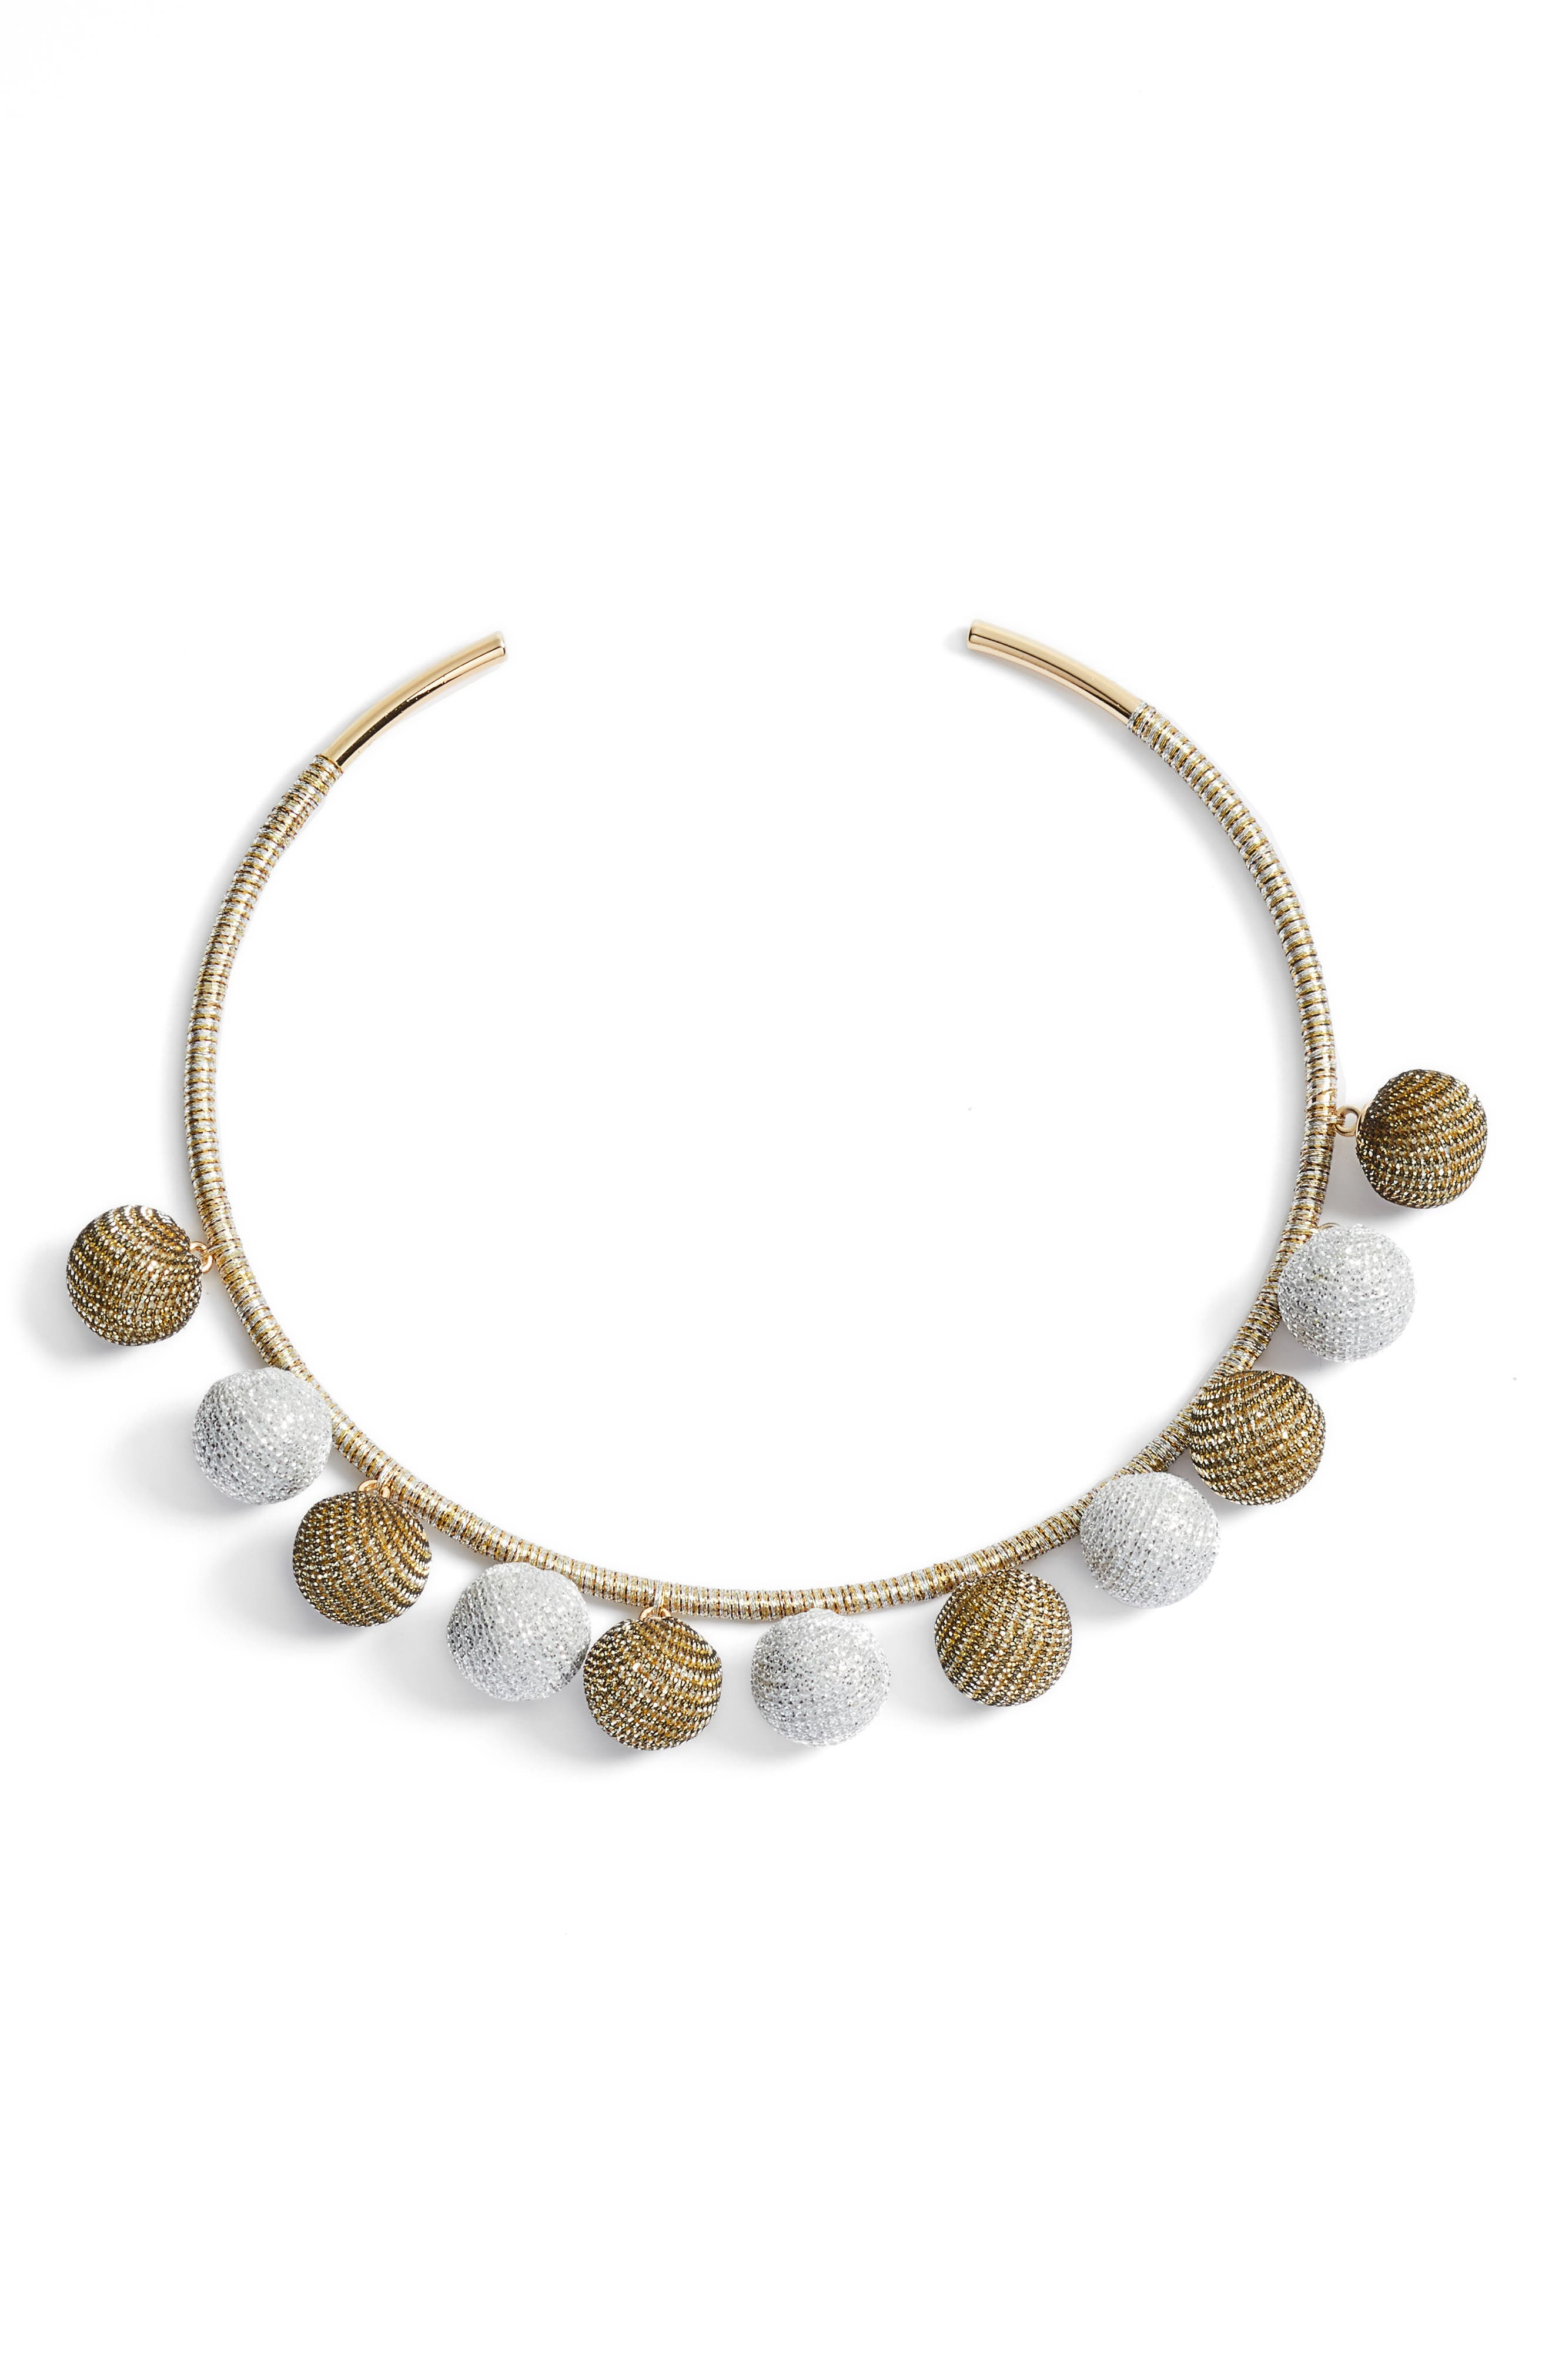 Alternate Image 1 Selected - Rebecca Minkoff High Shine Pompom Collar Necklace